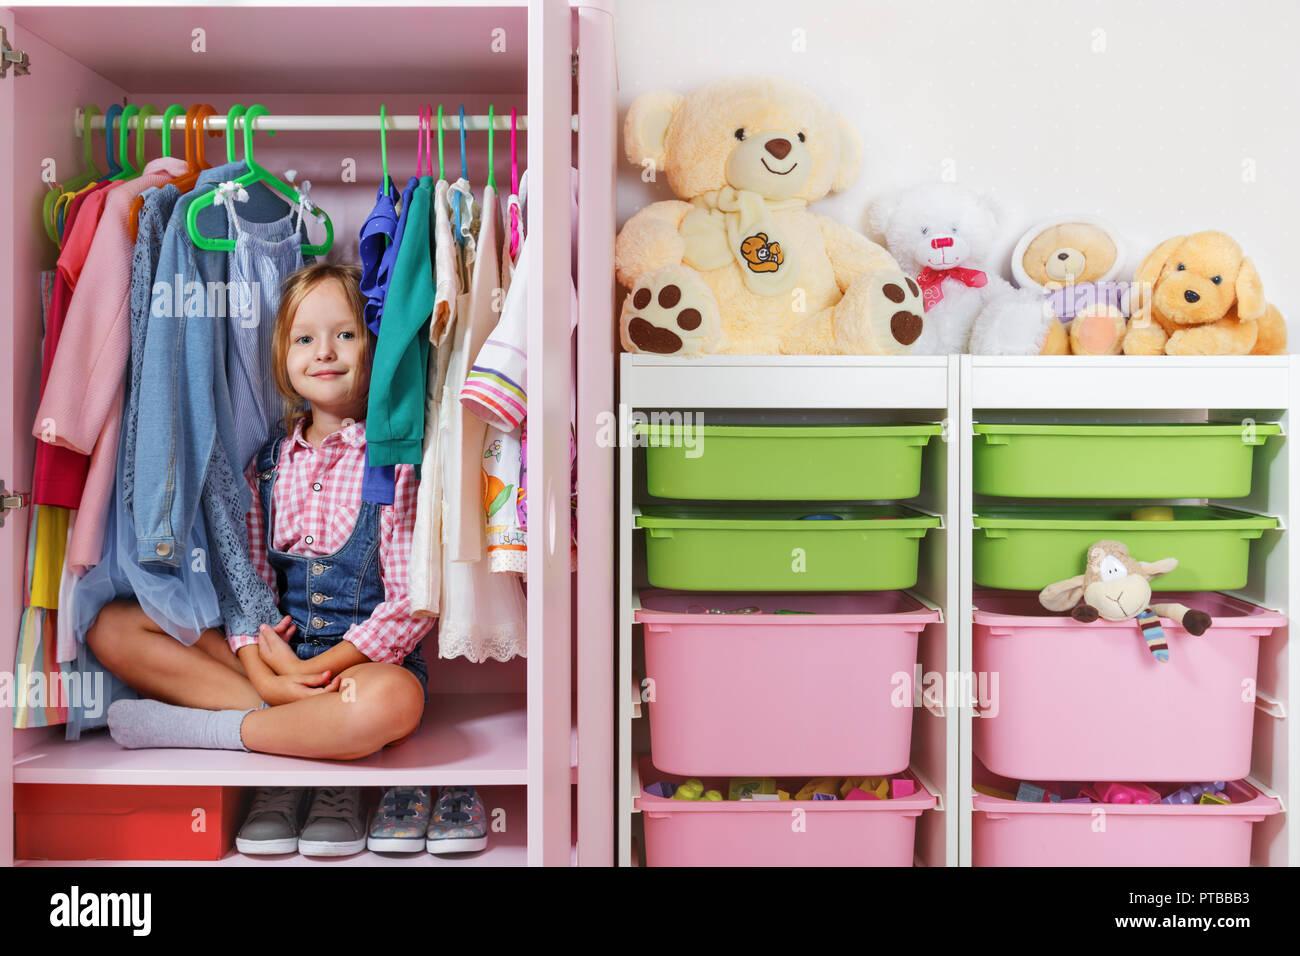 Un Está La En De Sentado Armario Pequeño Niño Niña Habitación BoWrdCxe